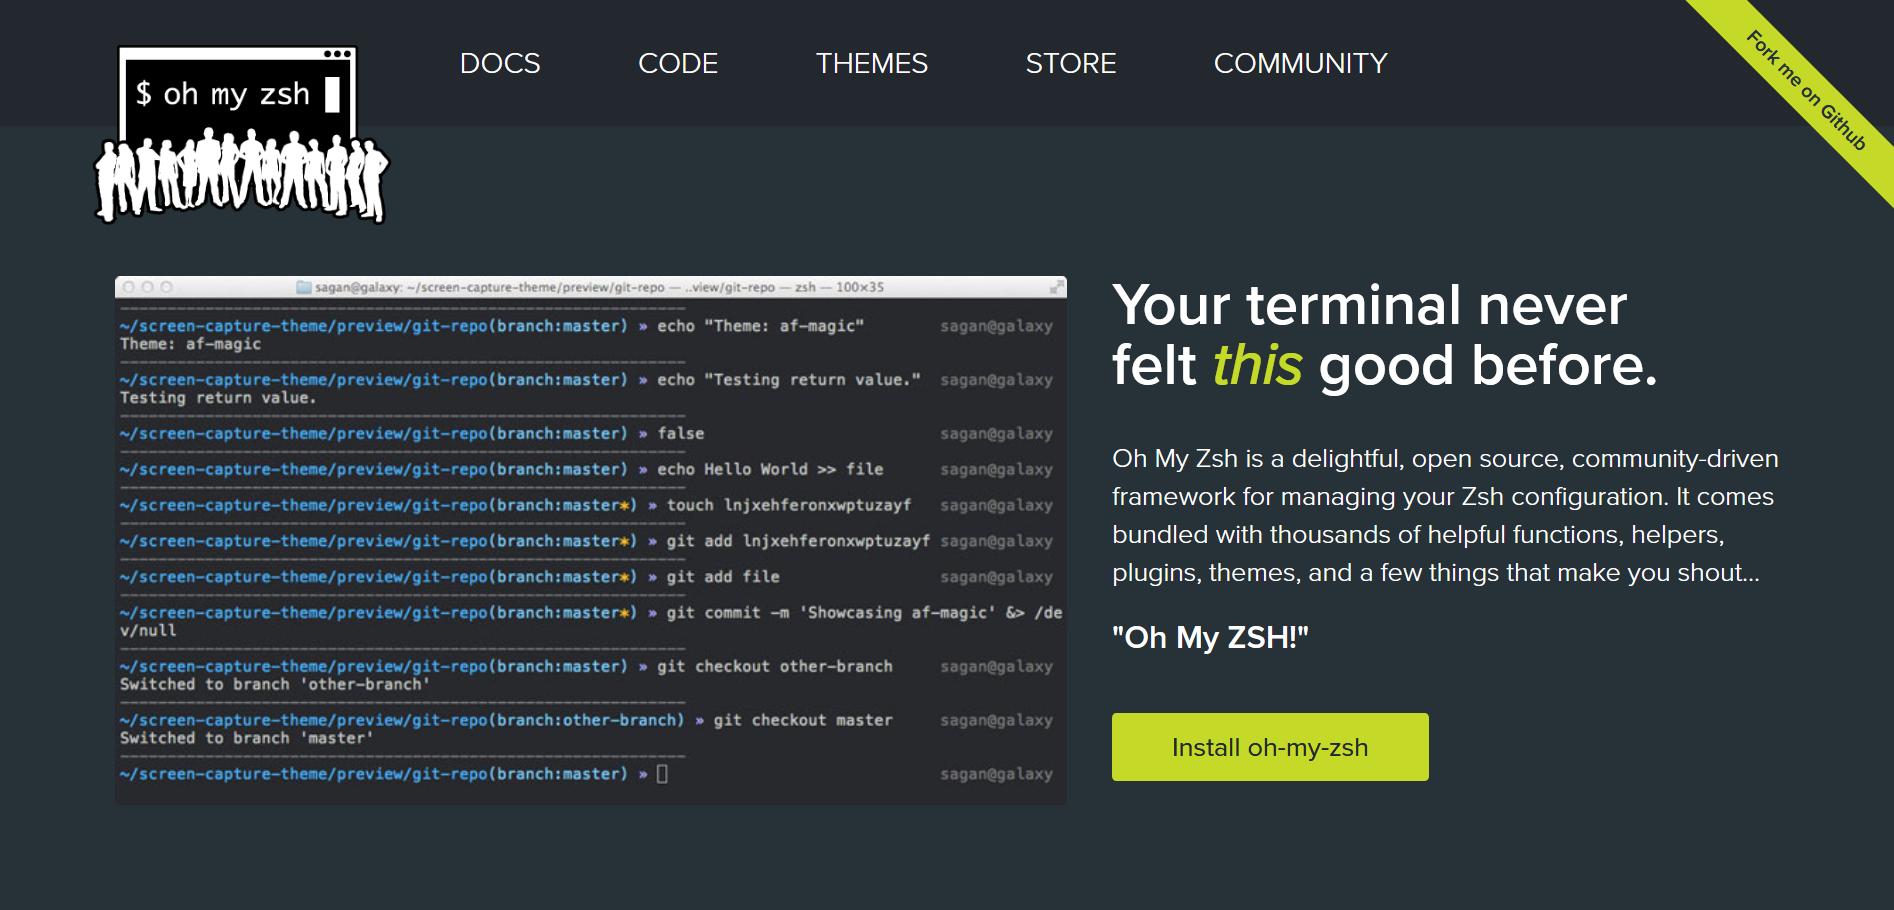 Screenshot_2020-11-06 Oh My Zsh - a delightful open-source framework for Zsh.png